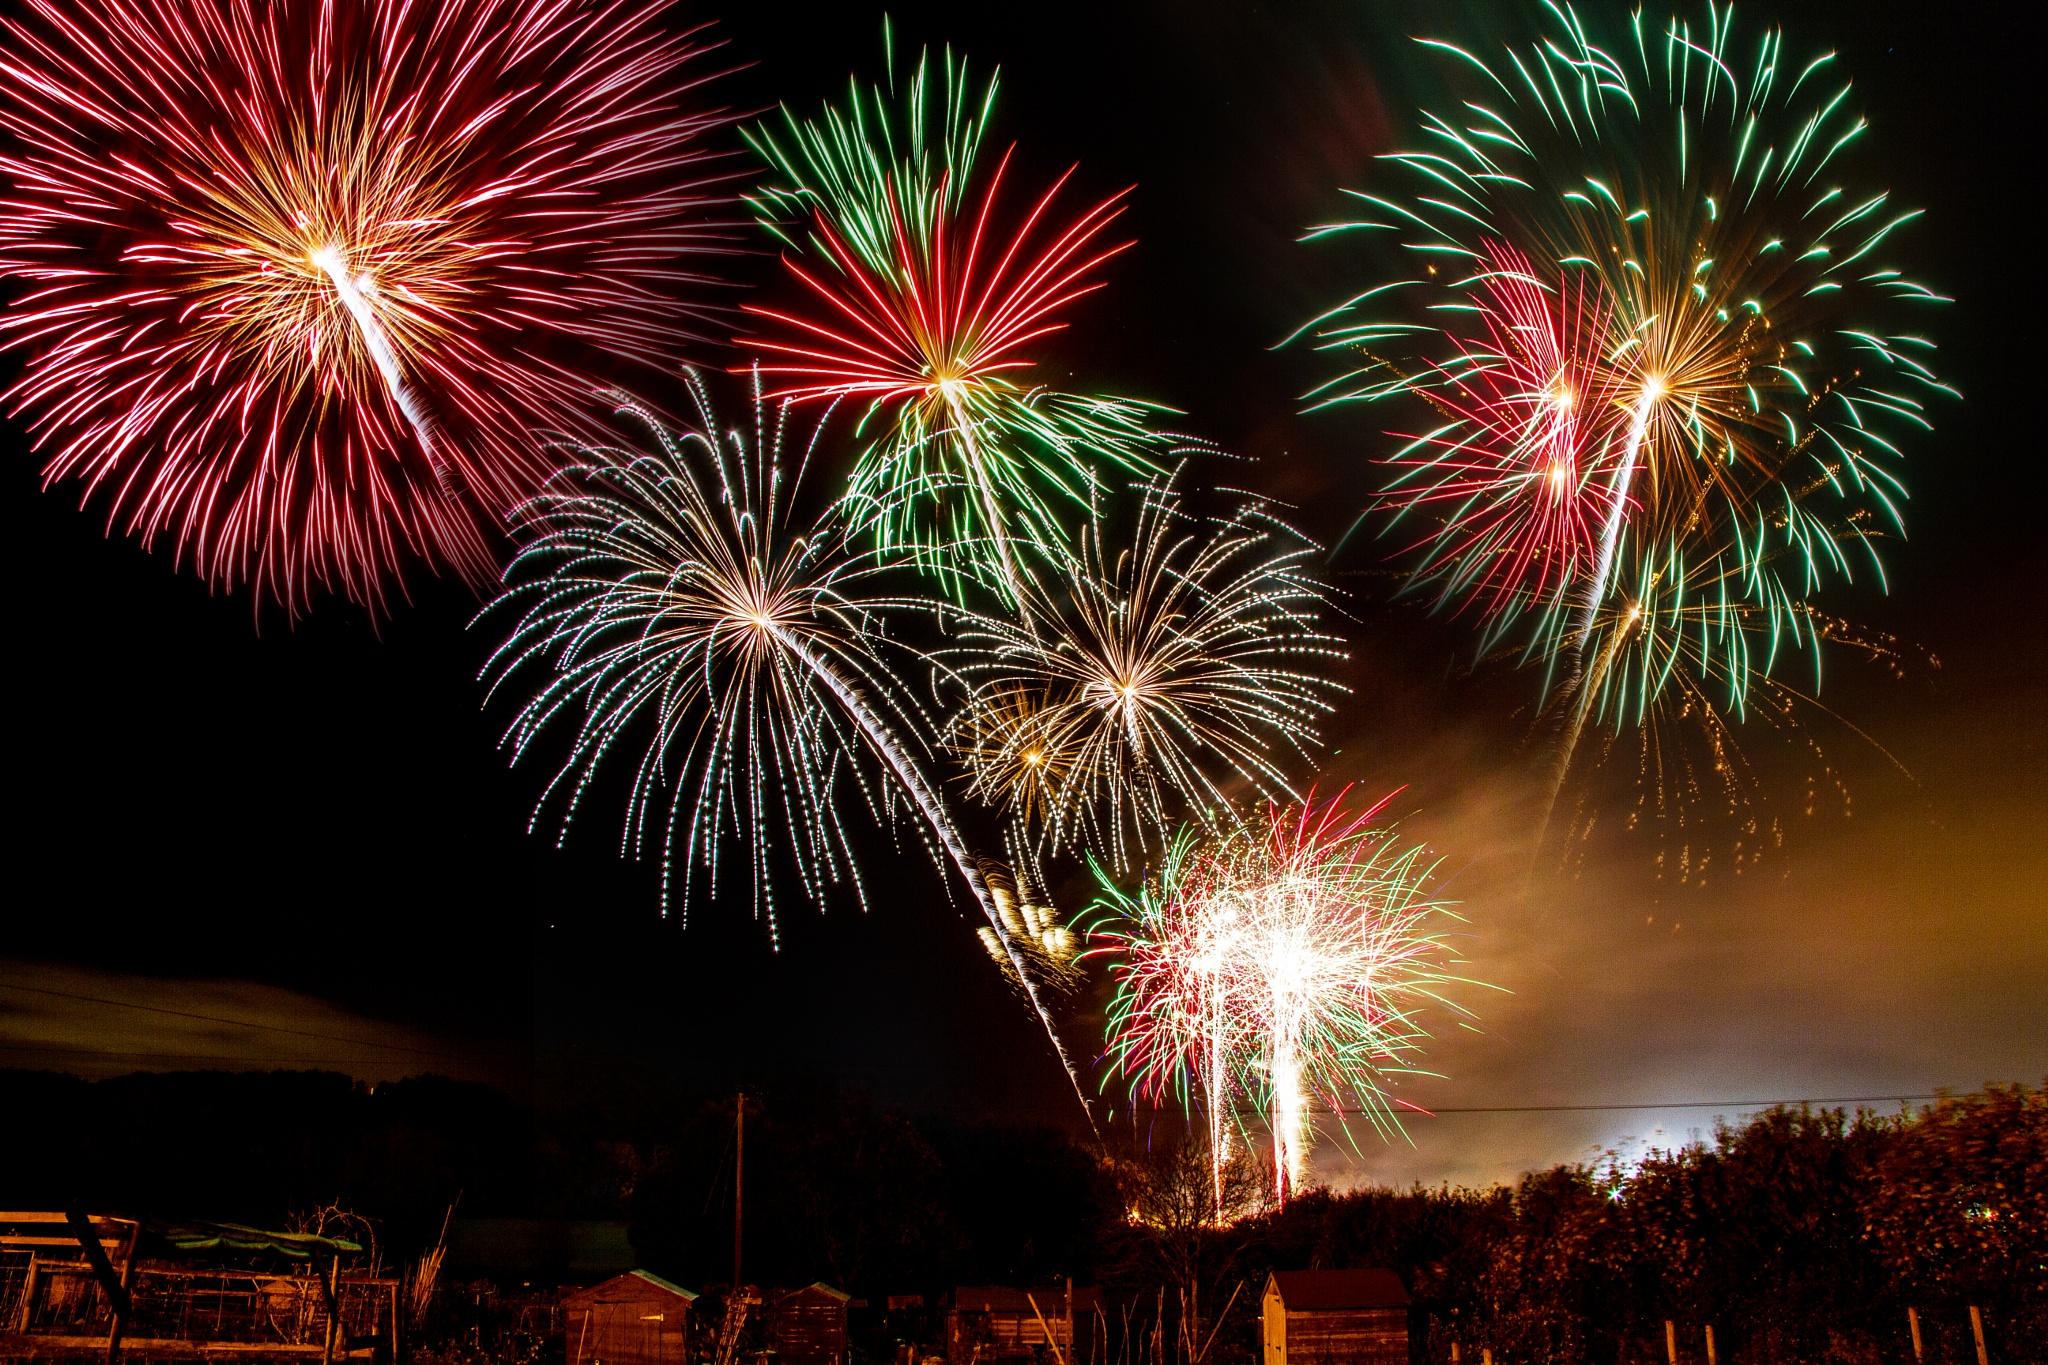 Thornbury Fireworks by Russ Summers